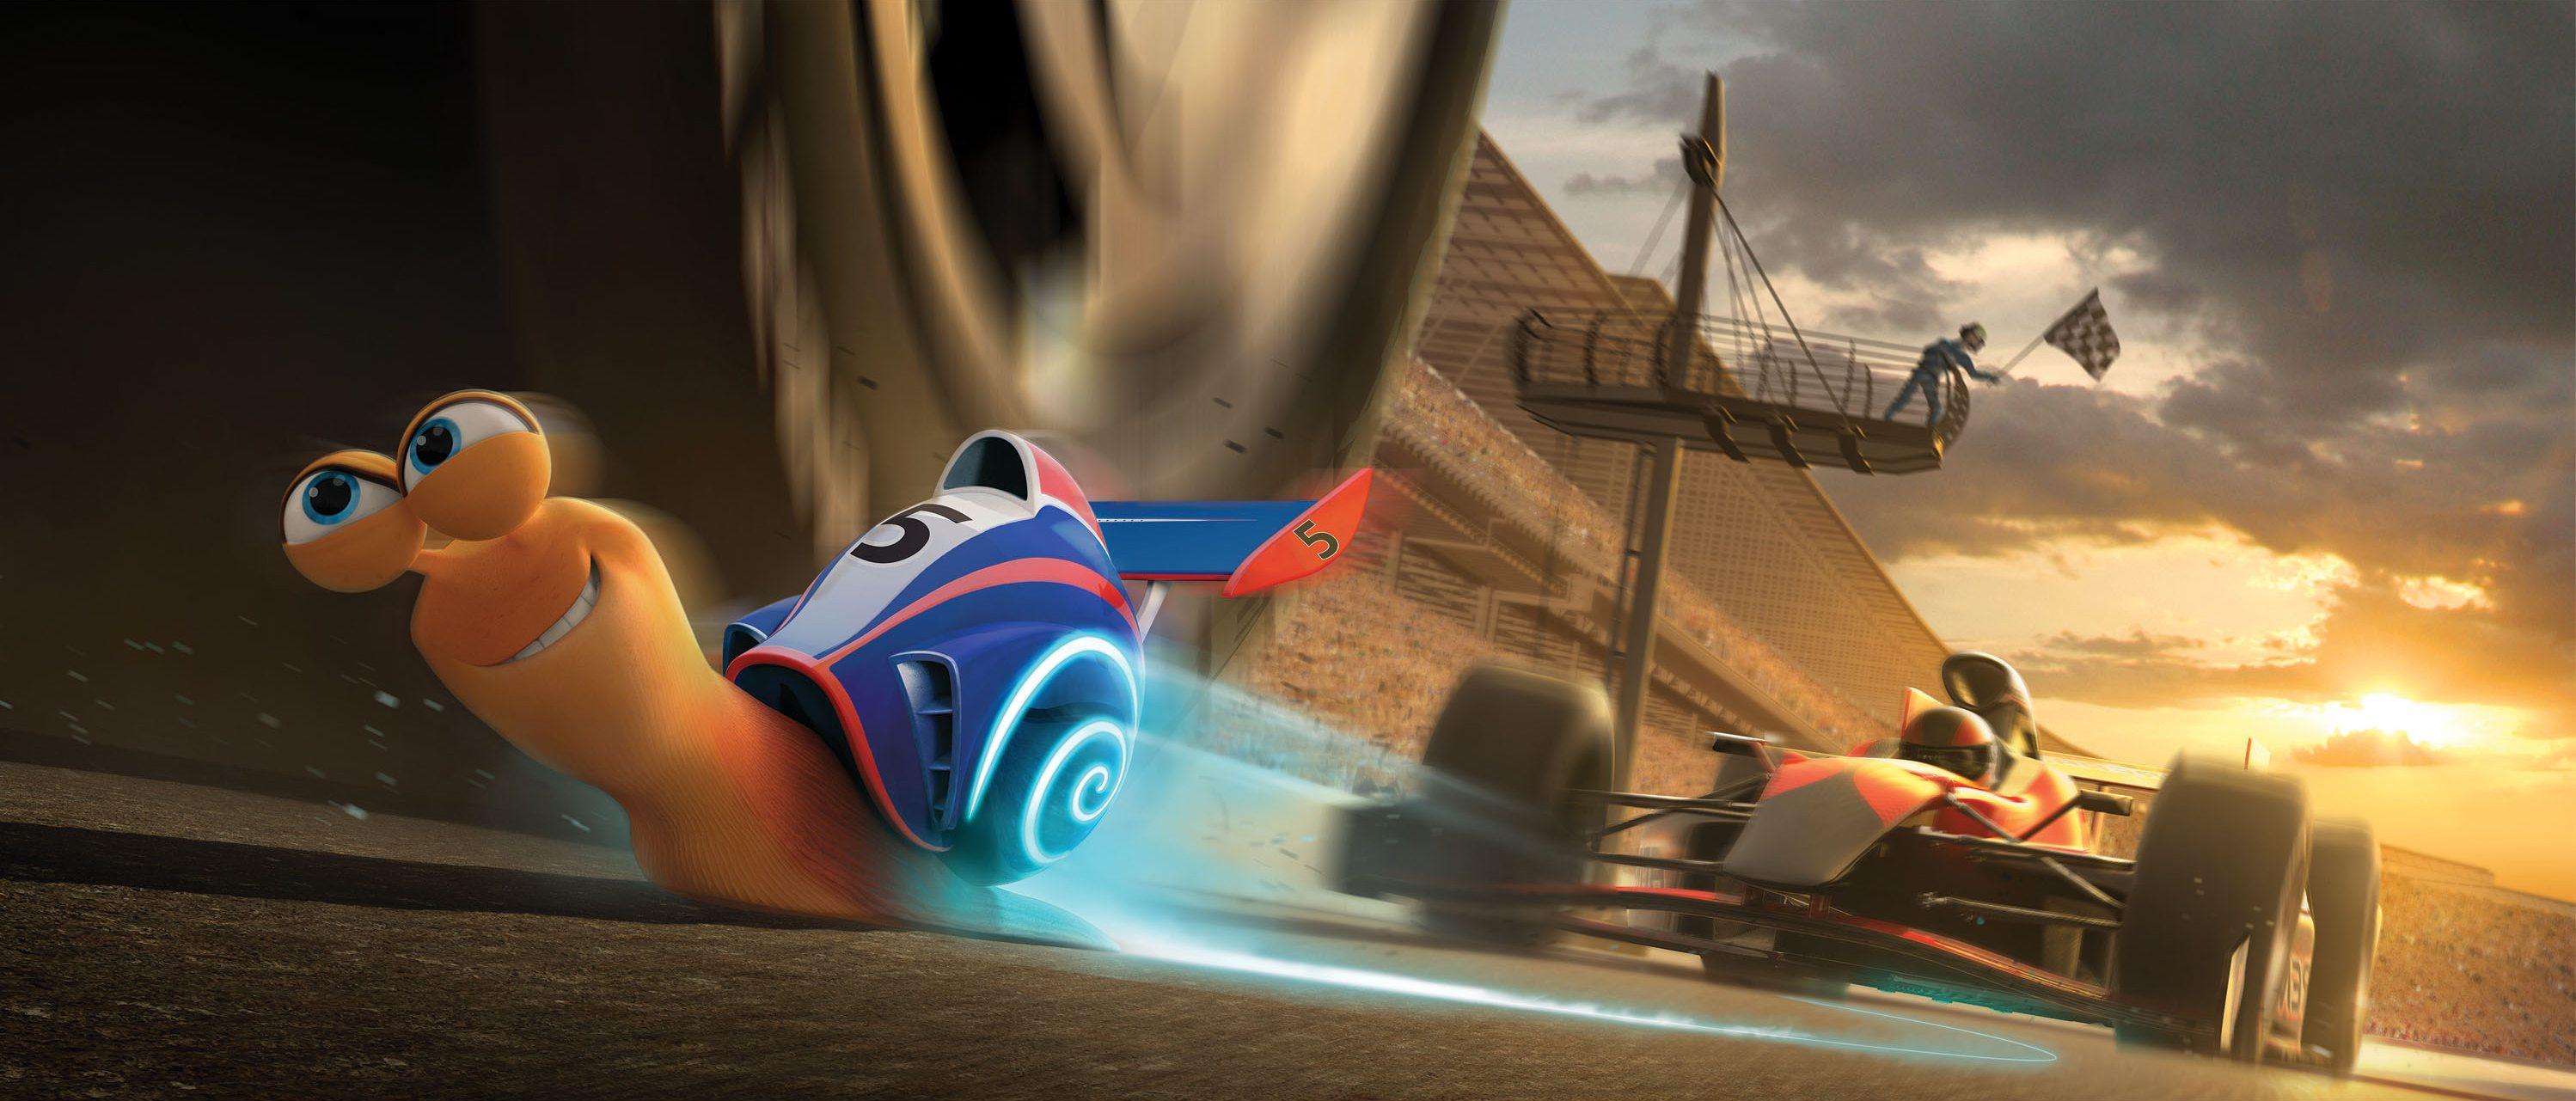 Turbo, Dreamworks Animation, Ryan Reynolds